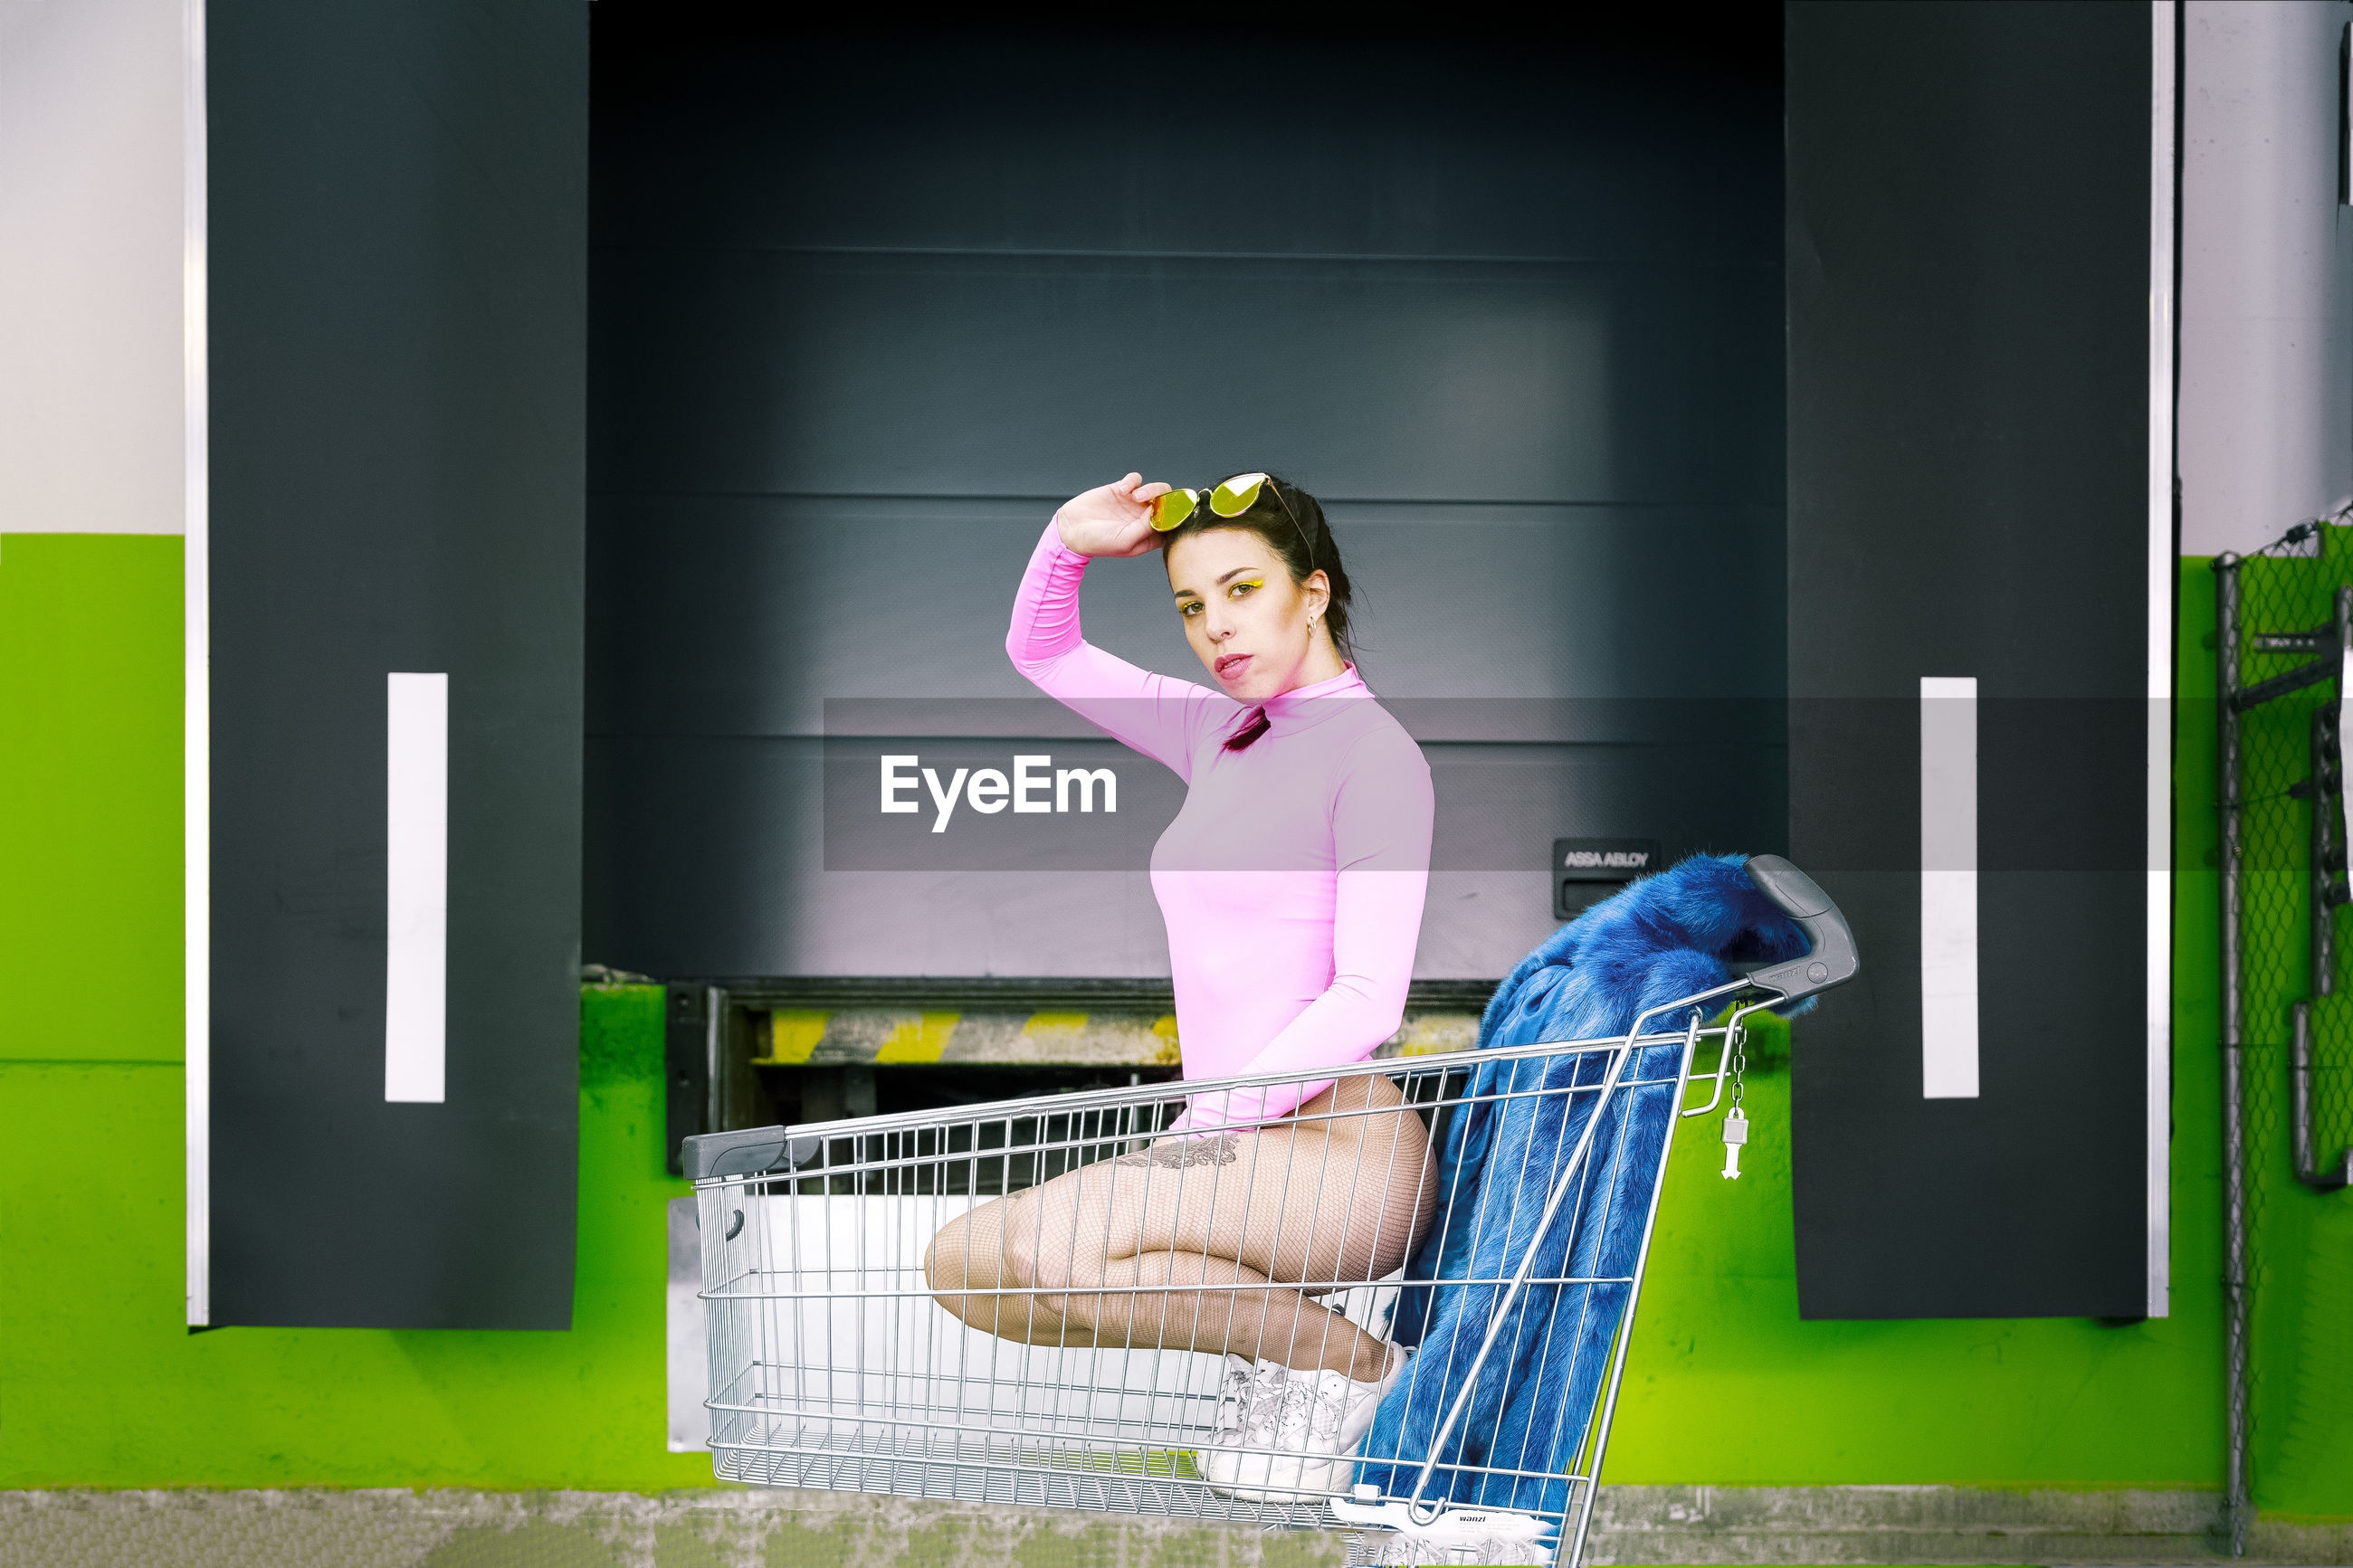 Portrait of sensuous woman crouching in shopping cart